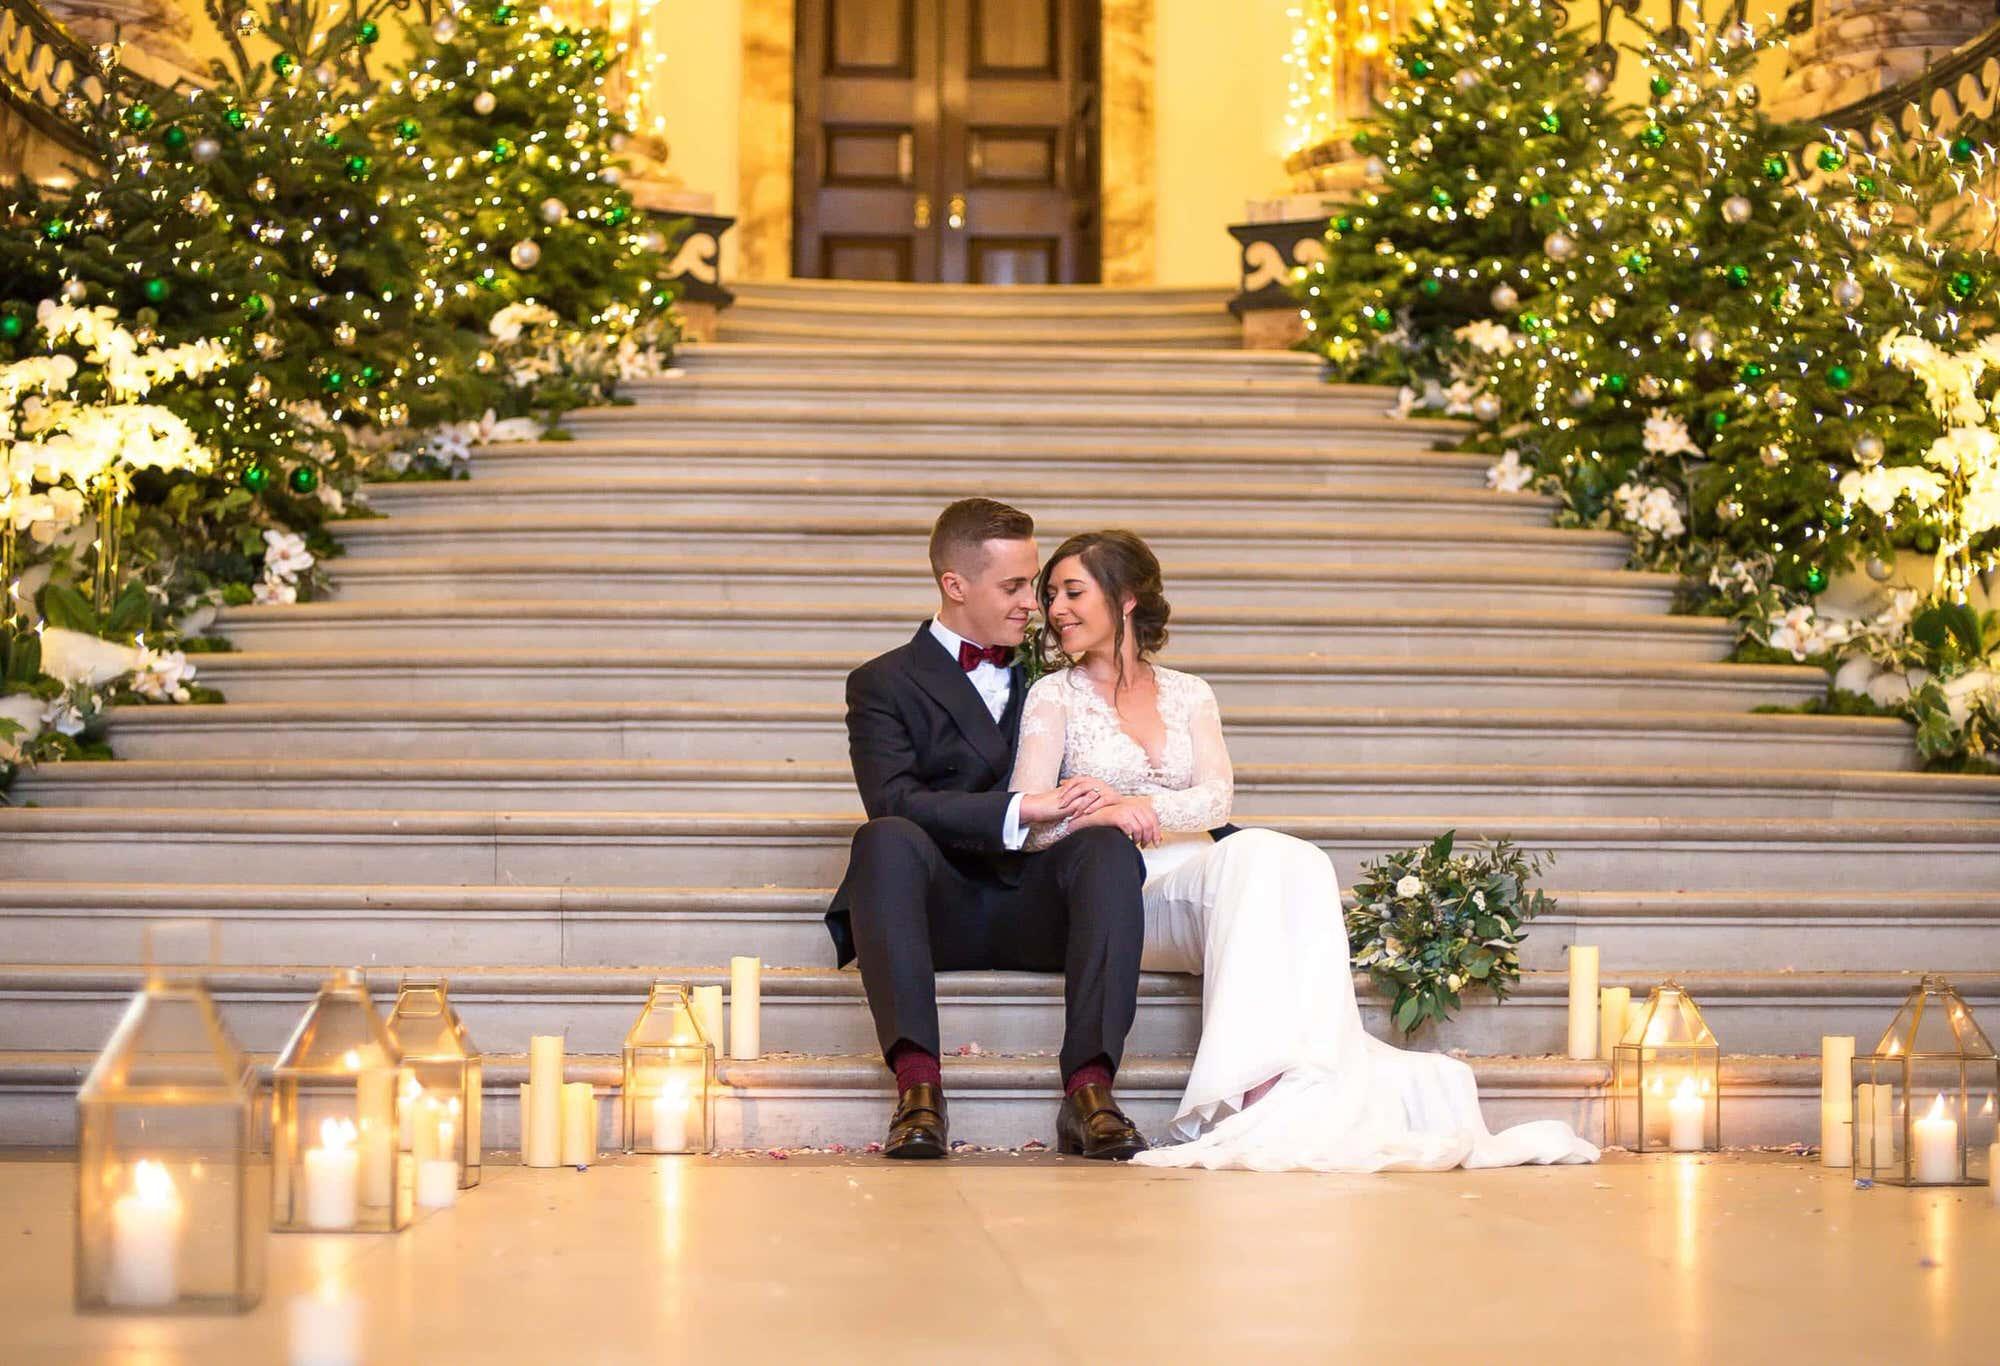 Newly Weds cuddling at Holkham Hall Weddings